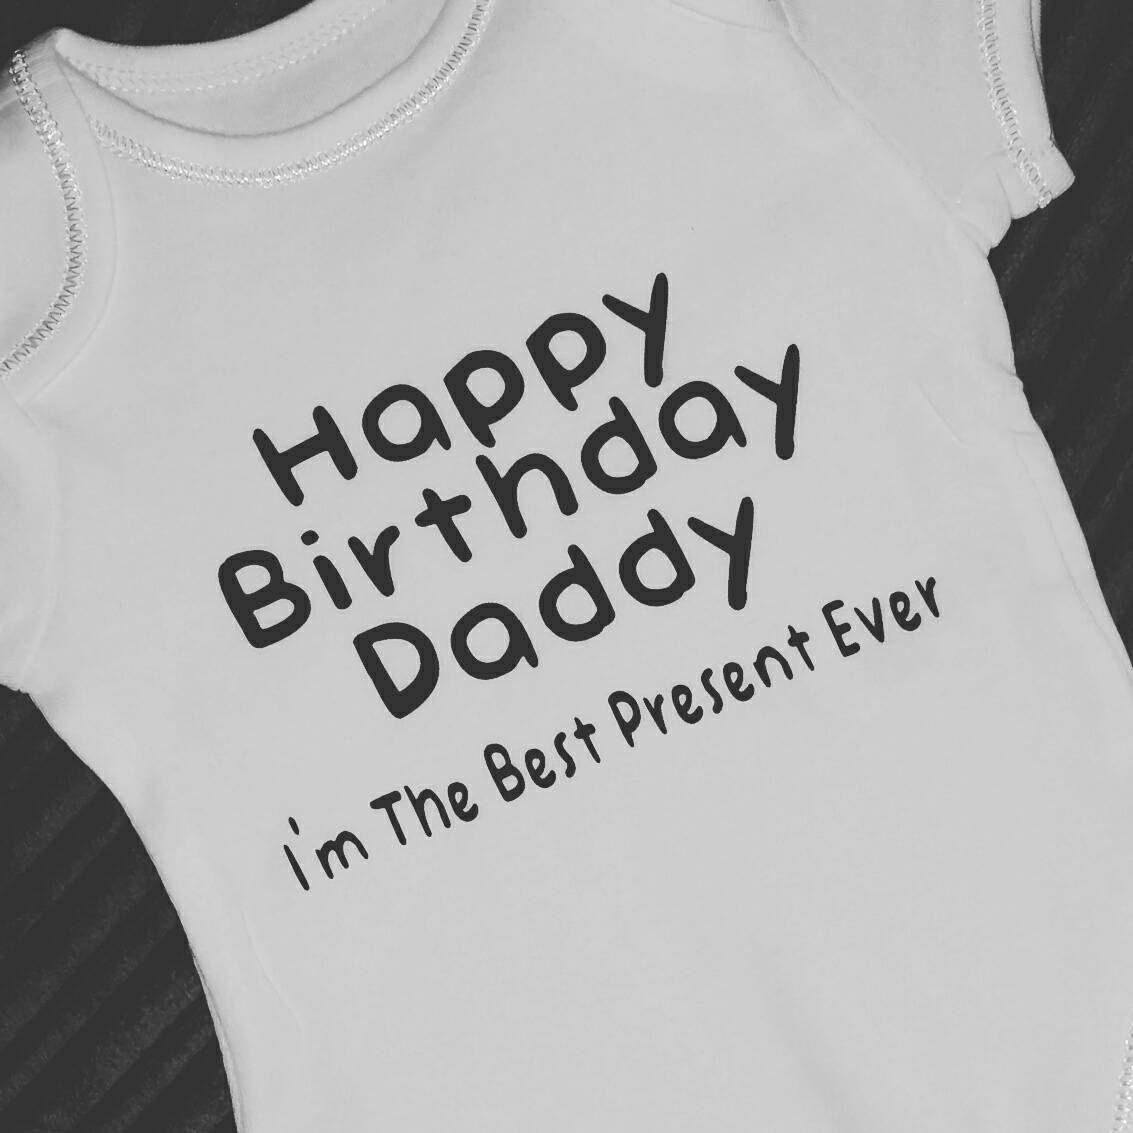 Happy Birthday Daddy New Baby Bodysuit Best Present Ever Father Gift Gifts For Men Girls Babygrow Boys Wear Kids